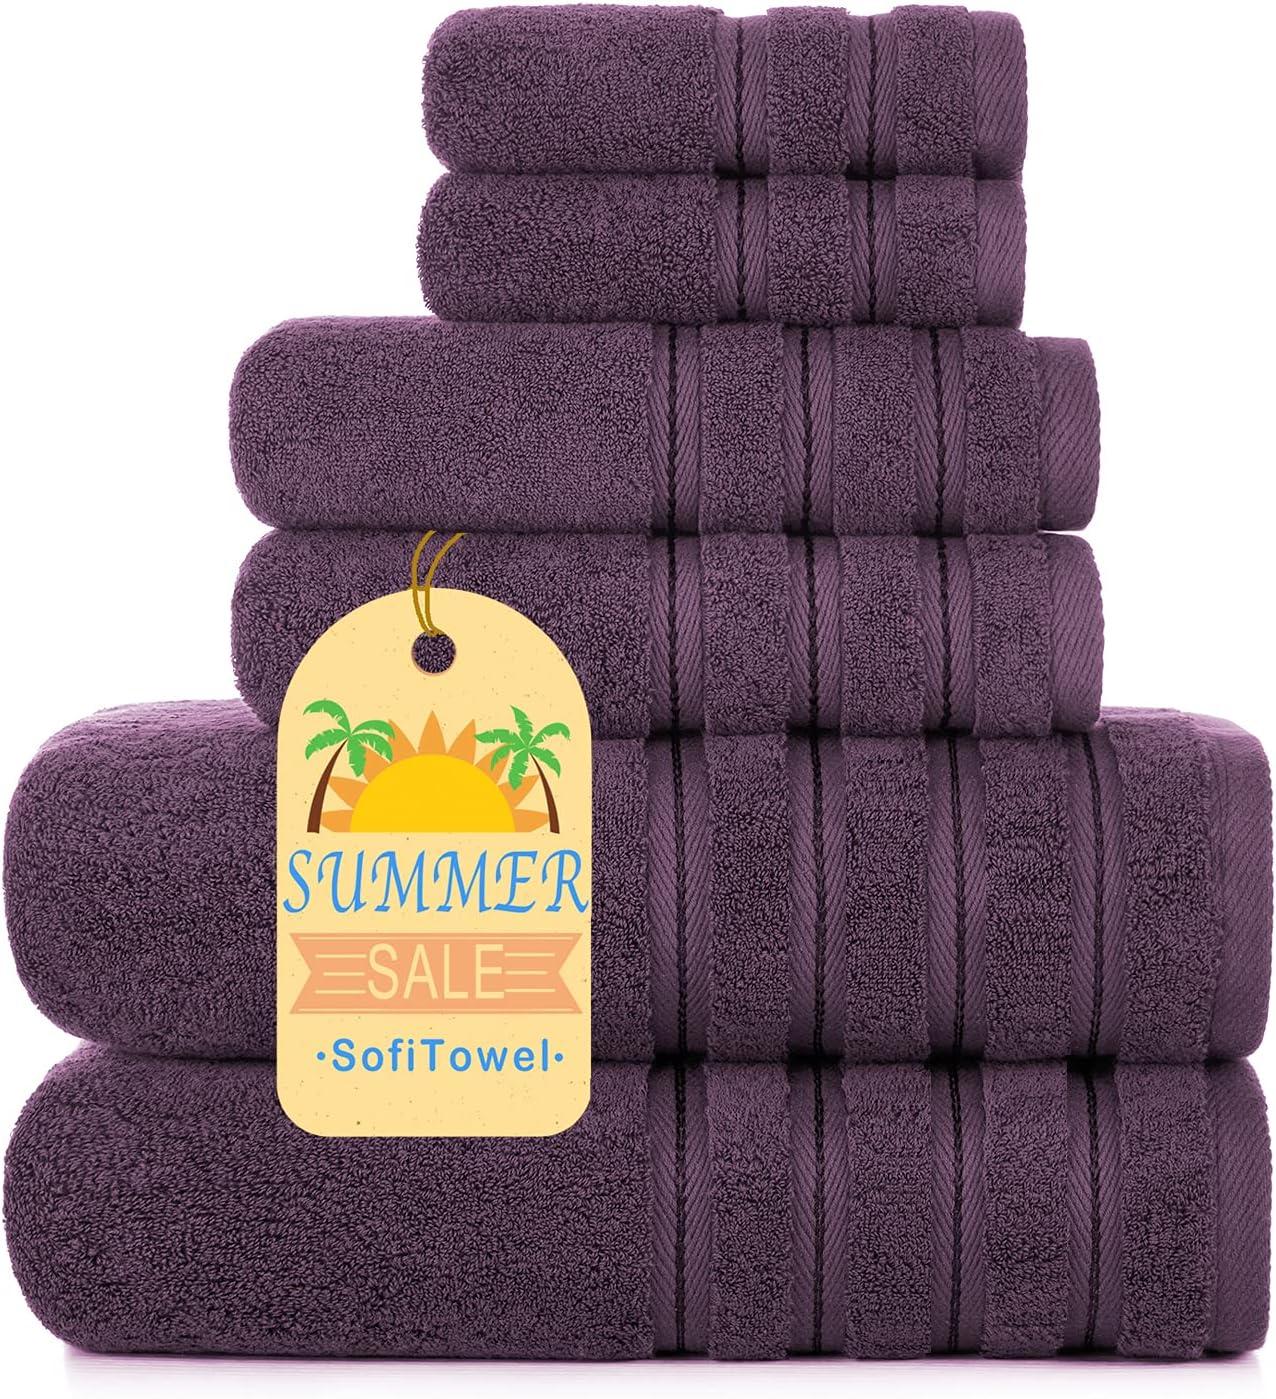 Sofi Towel Luxury Turkish Bath Fluffy Towels Set Piece 新作製品 ショップ 世界最高品質人気 6